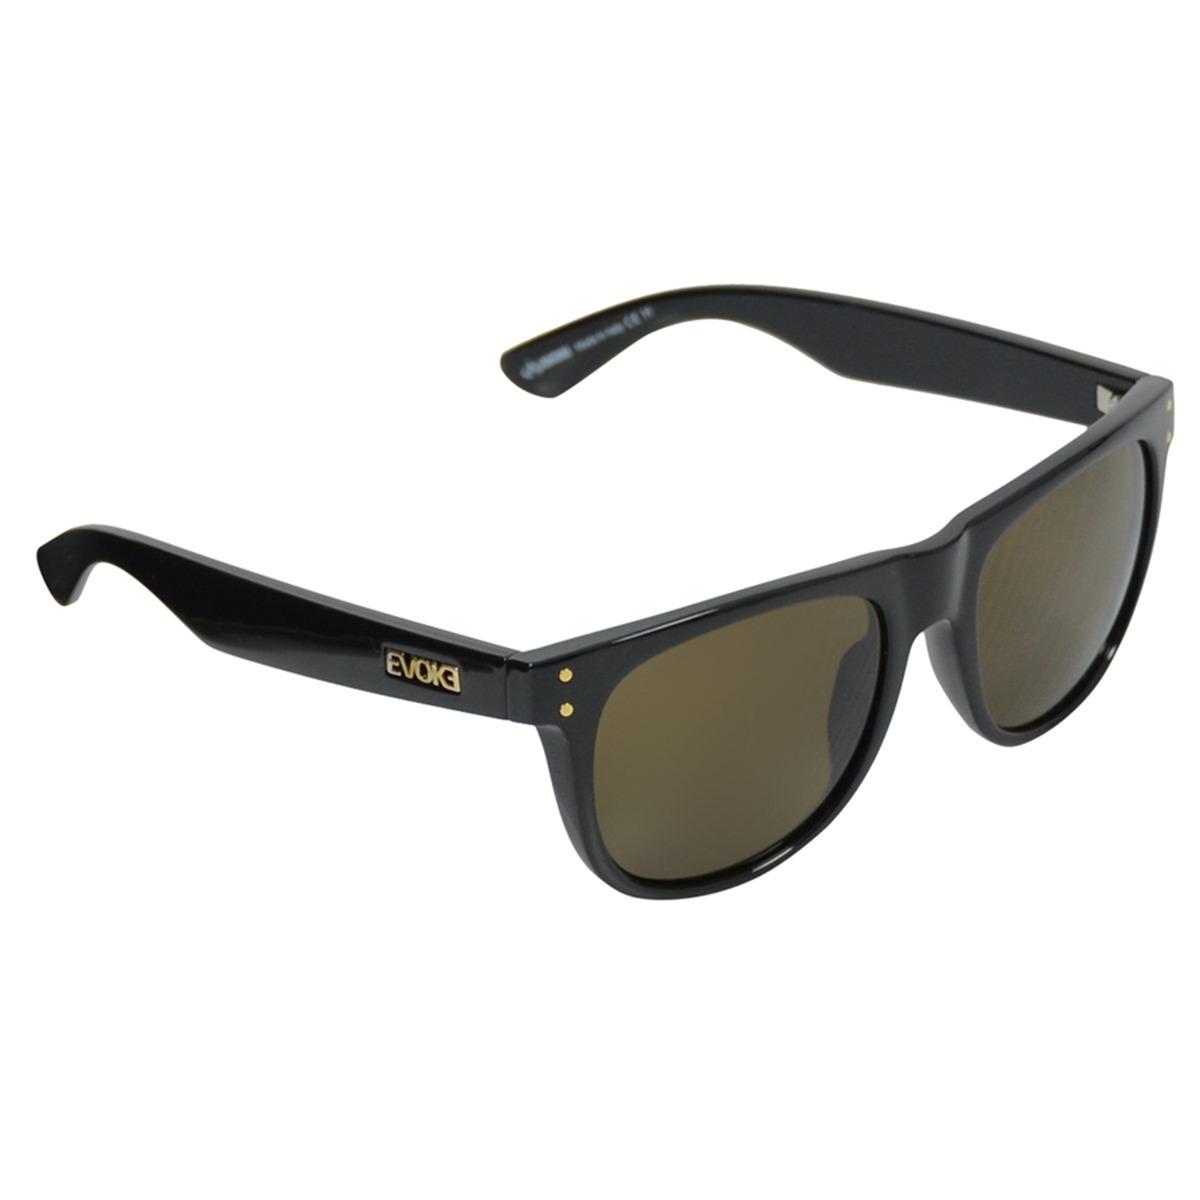 Óculos Evoke On The Rocks Black Shine Gold - R  596,70 em Mercado Livre aae8574efd